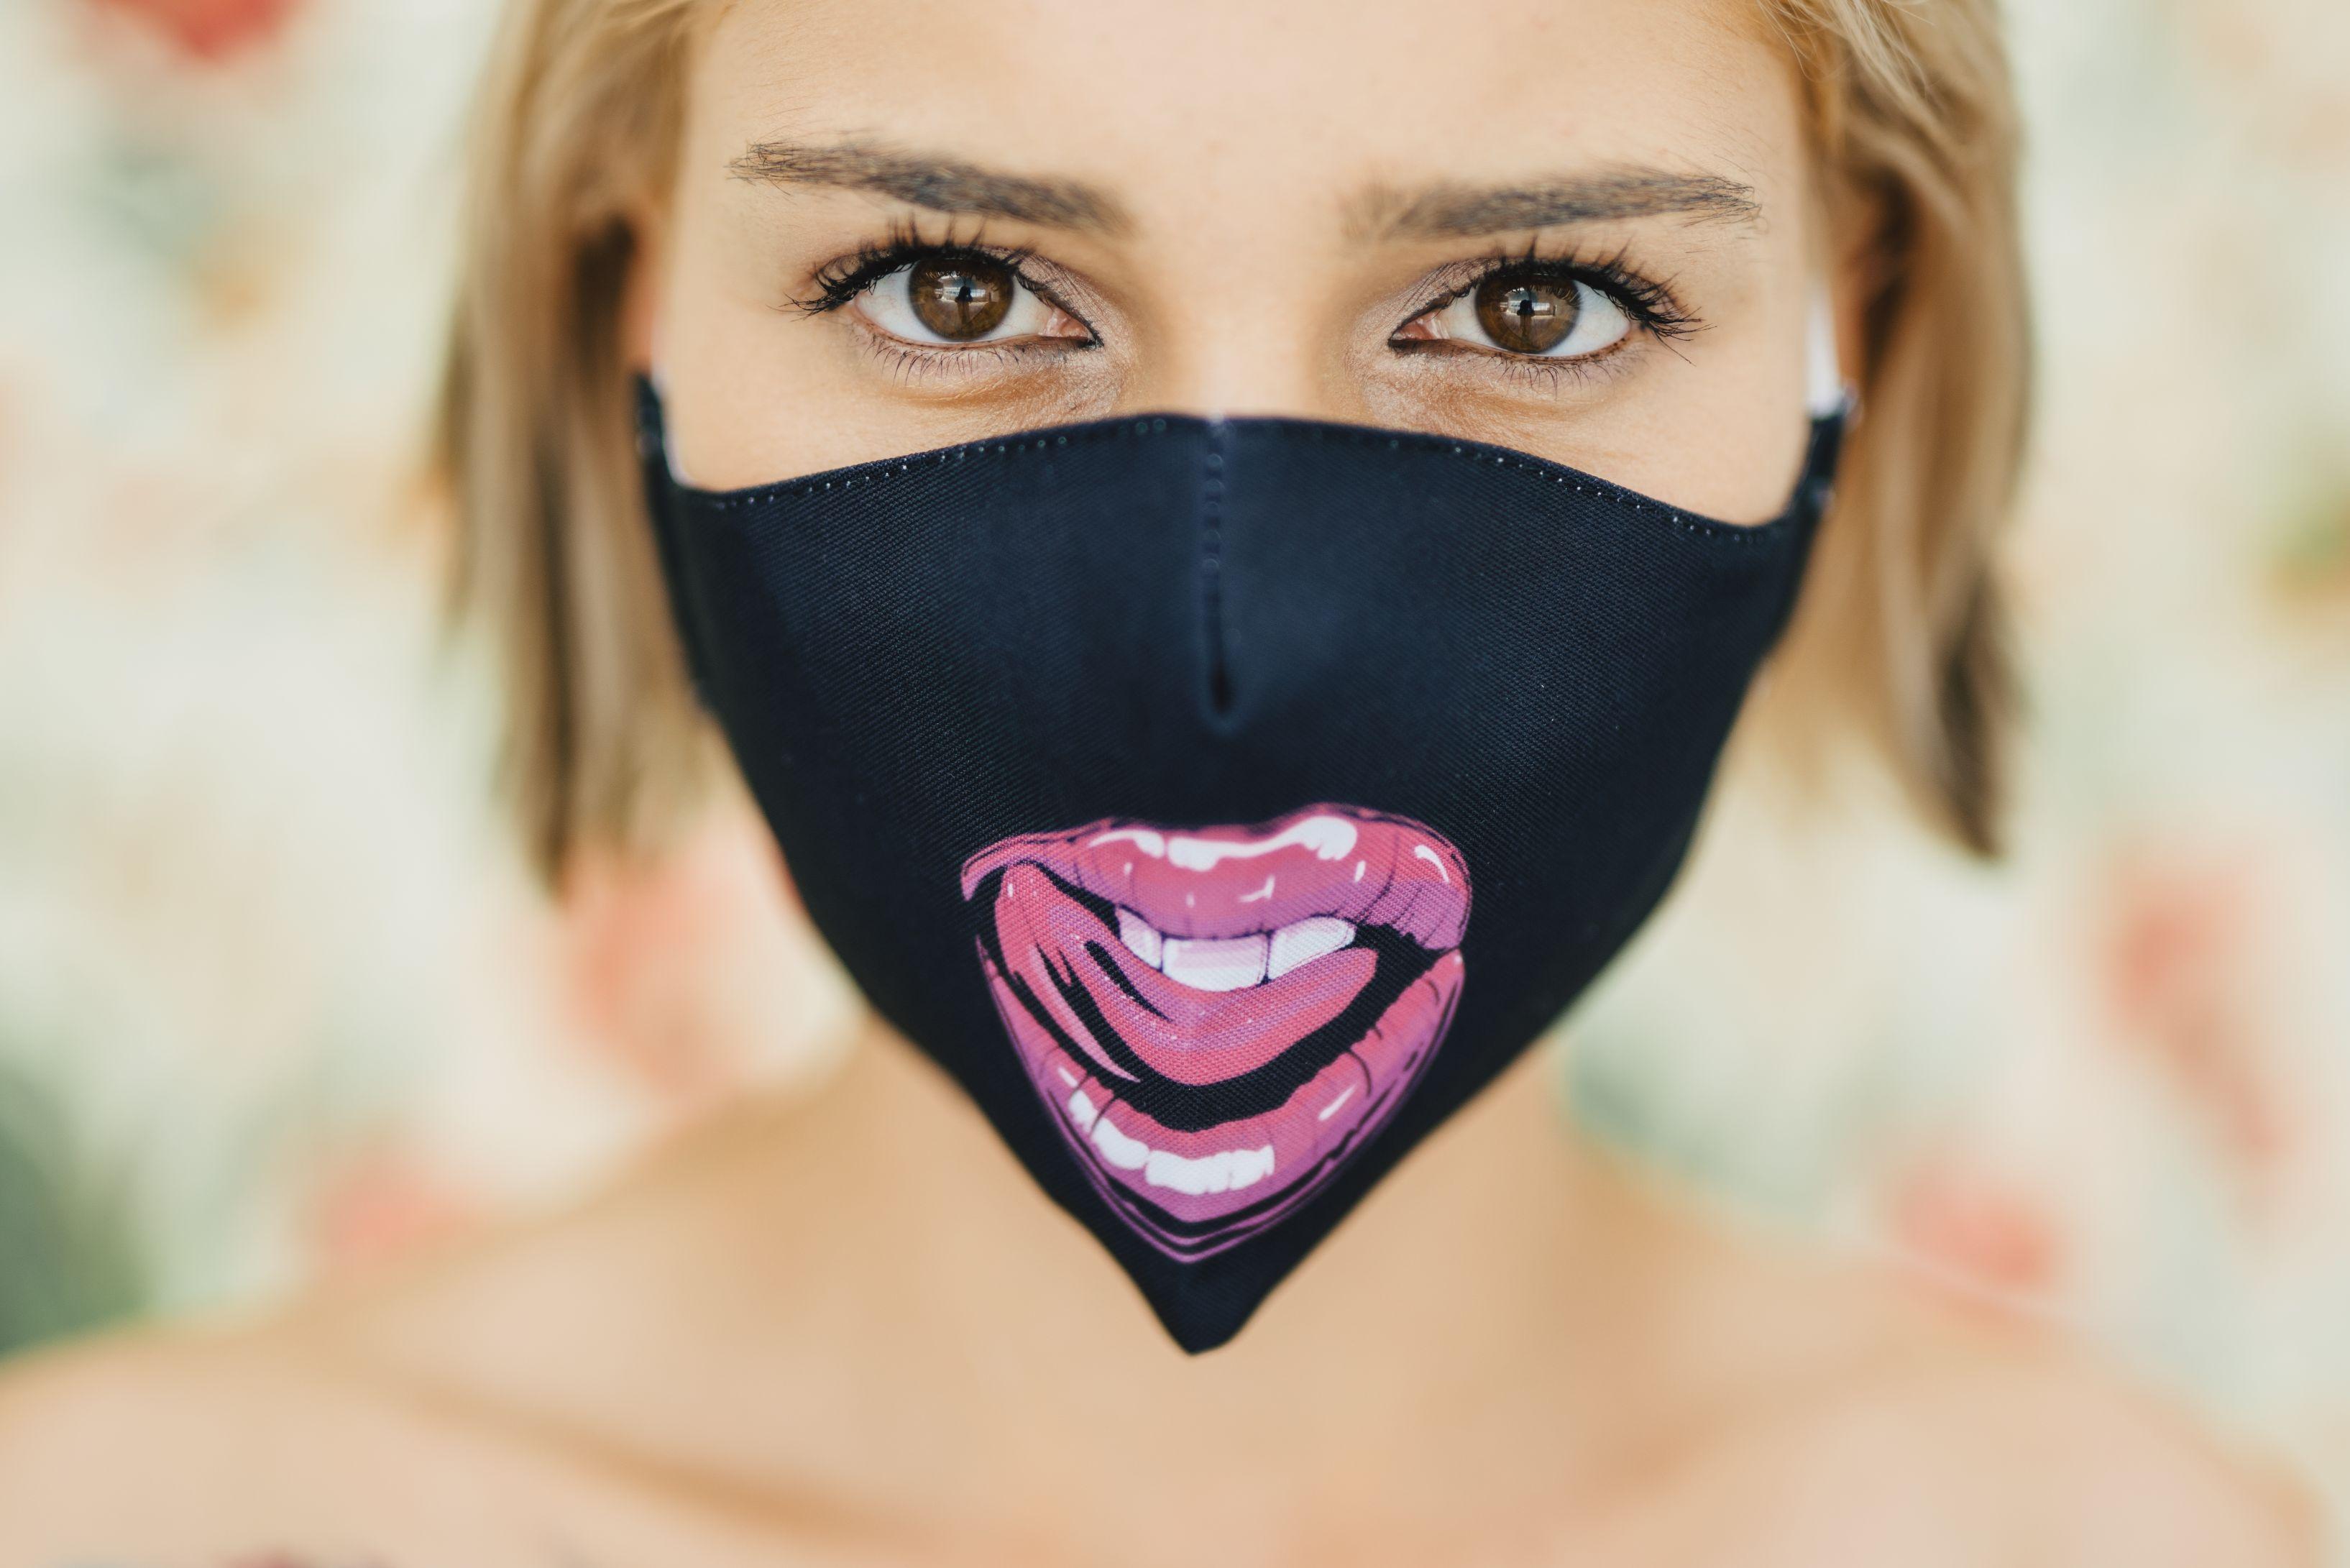 Mască Lips - 29 LEI |  PRINTCENTER - Tipar digital, offset, indoor, outdoor